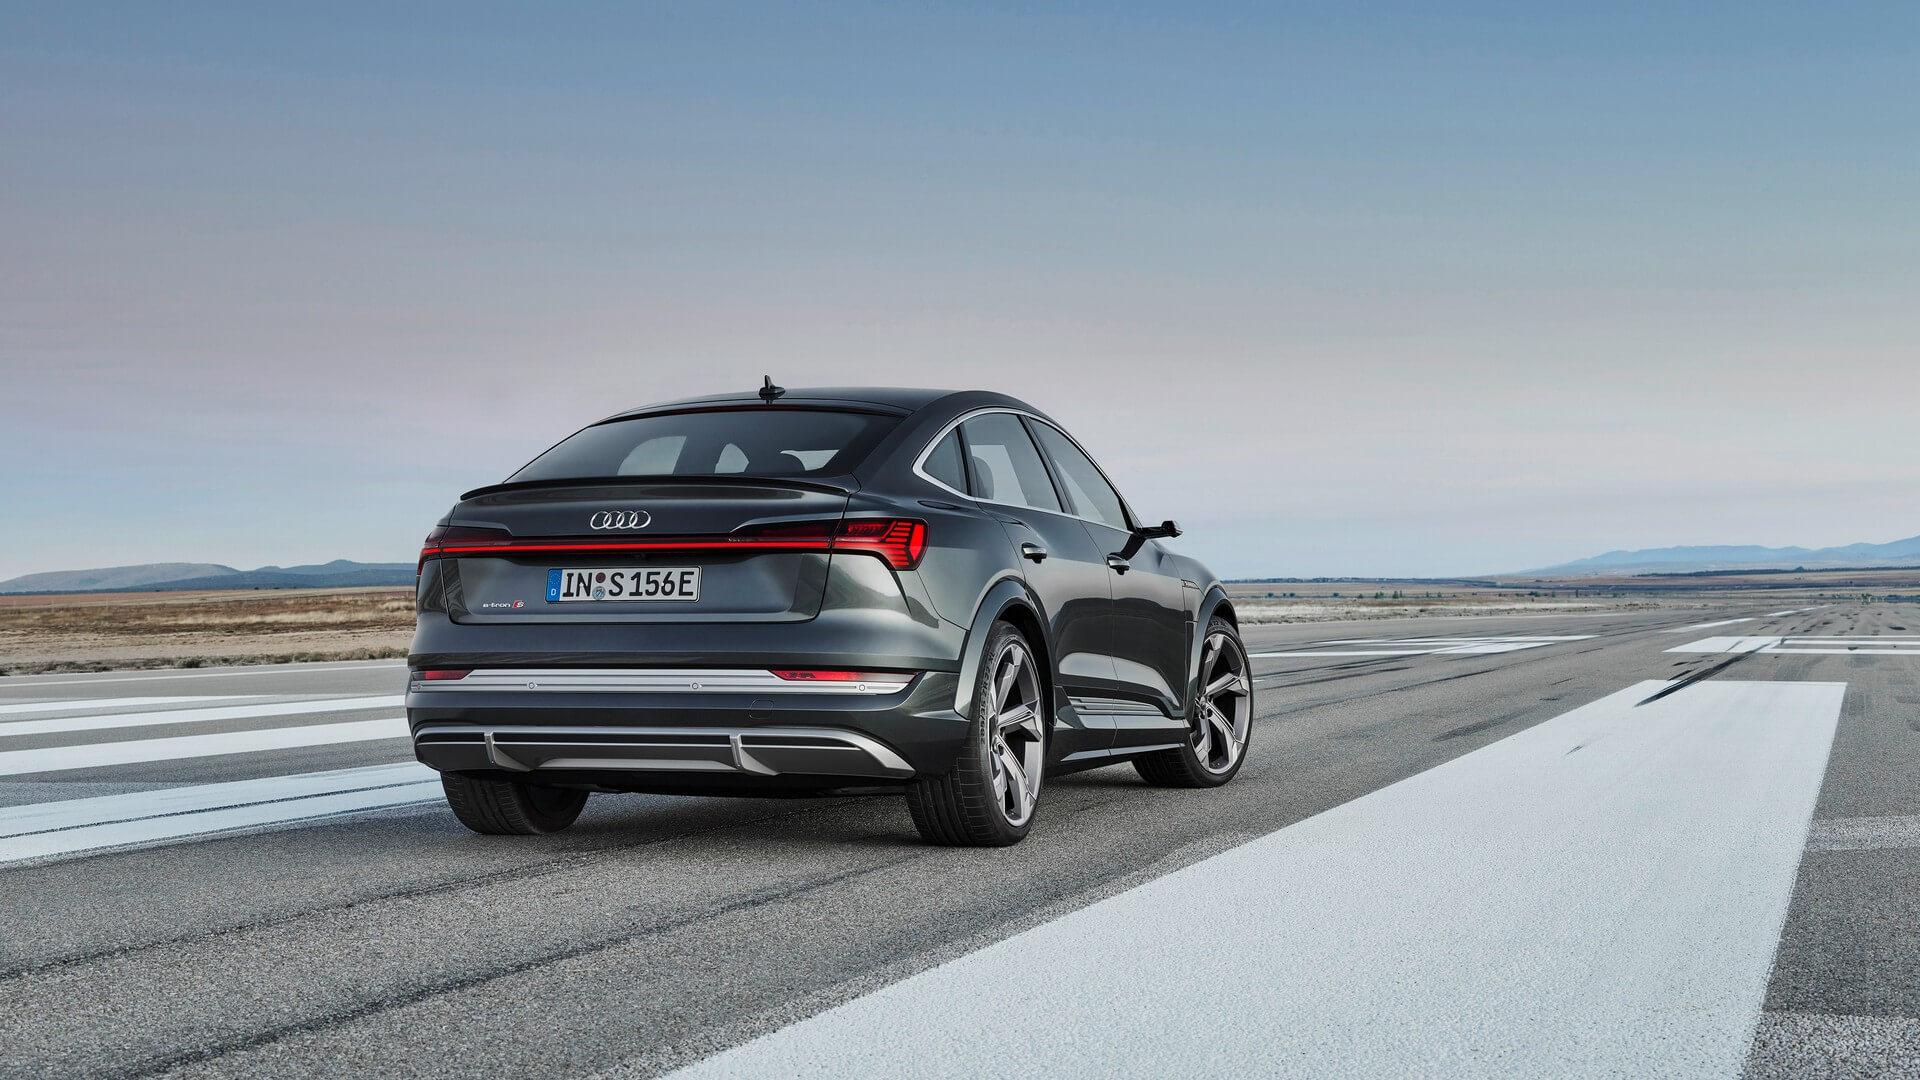 Audi-E-Tron-S-and-E-Tron-S-Sportback-2020-70